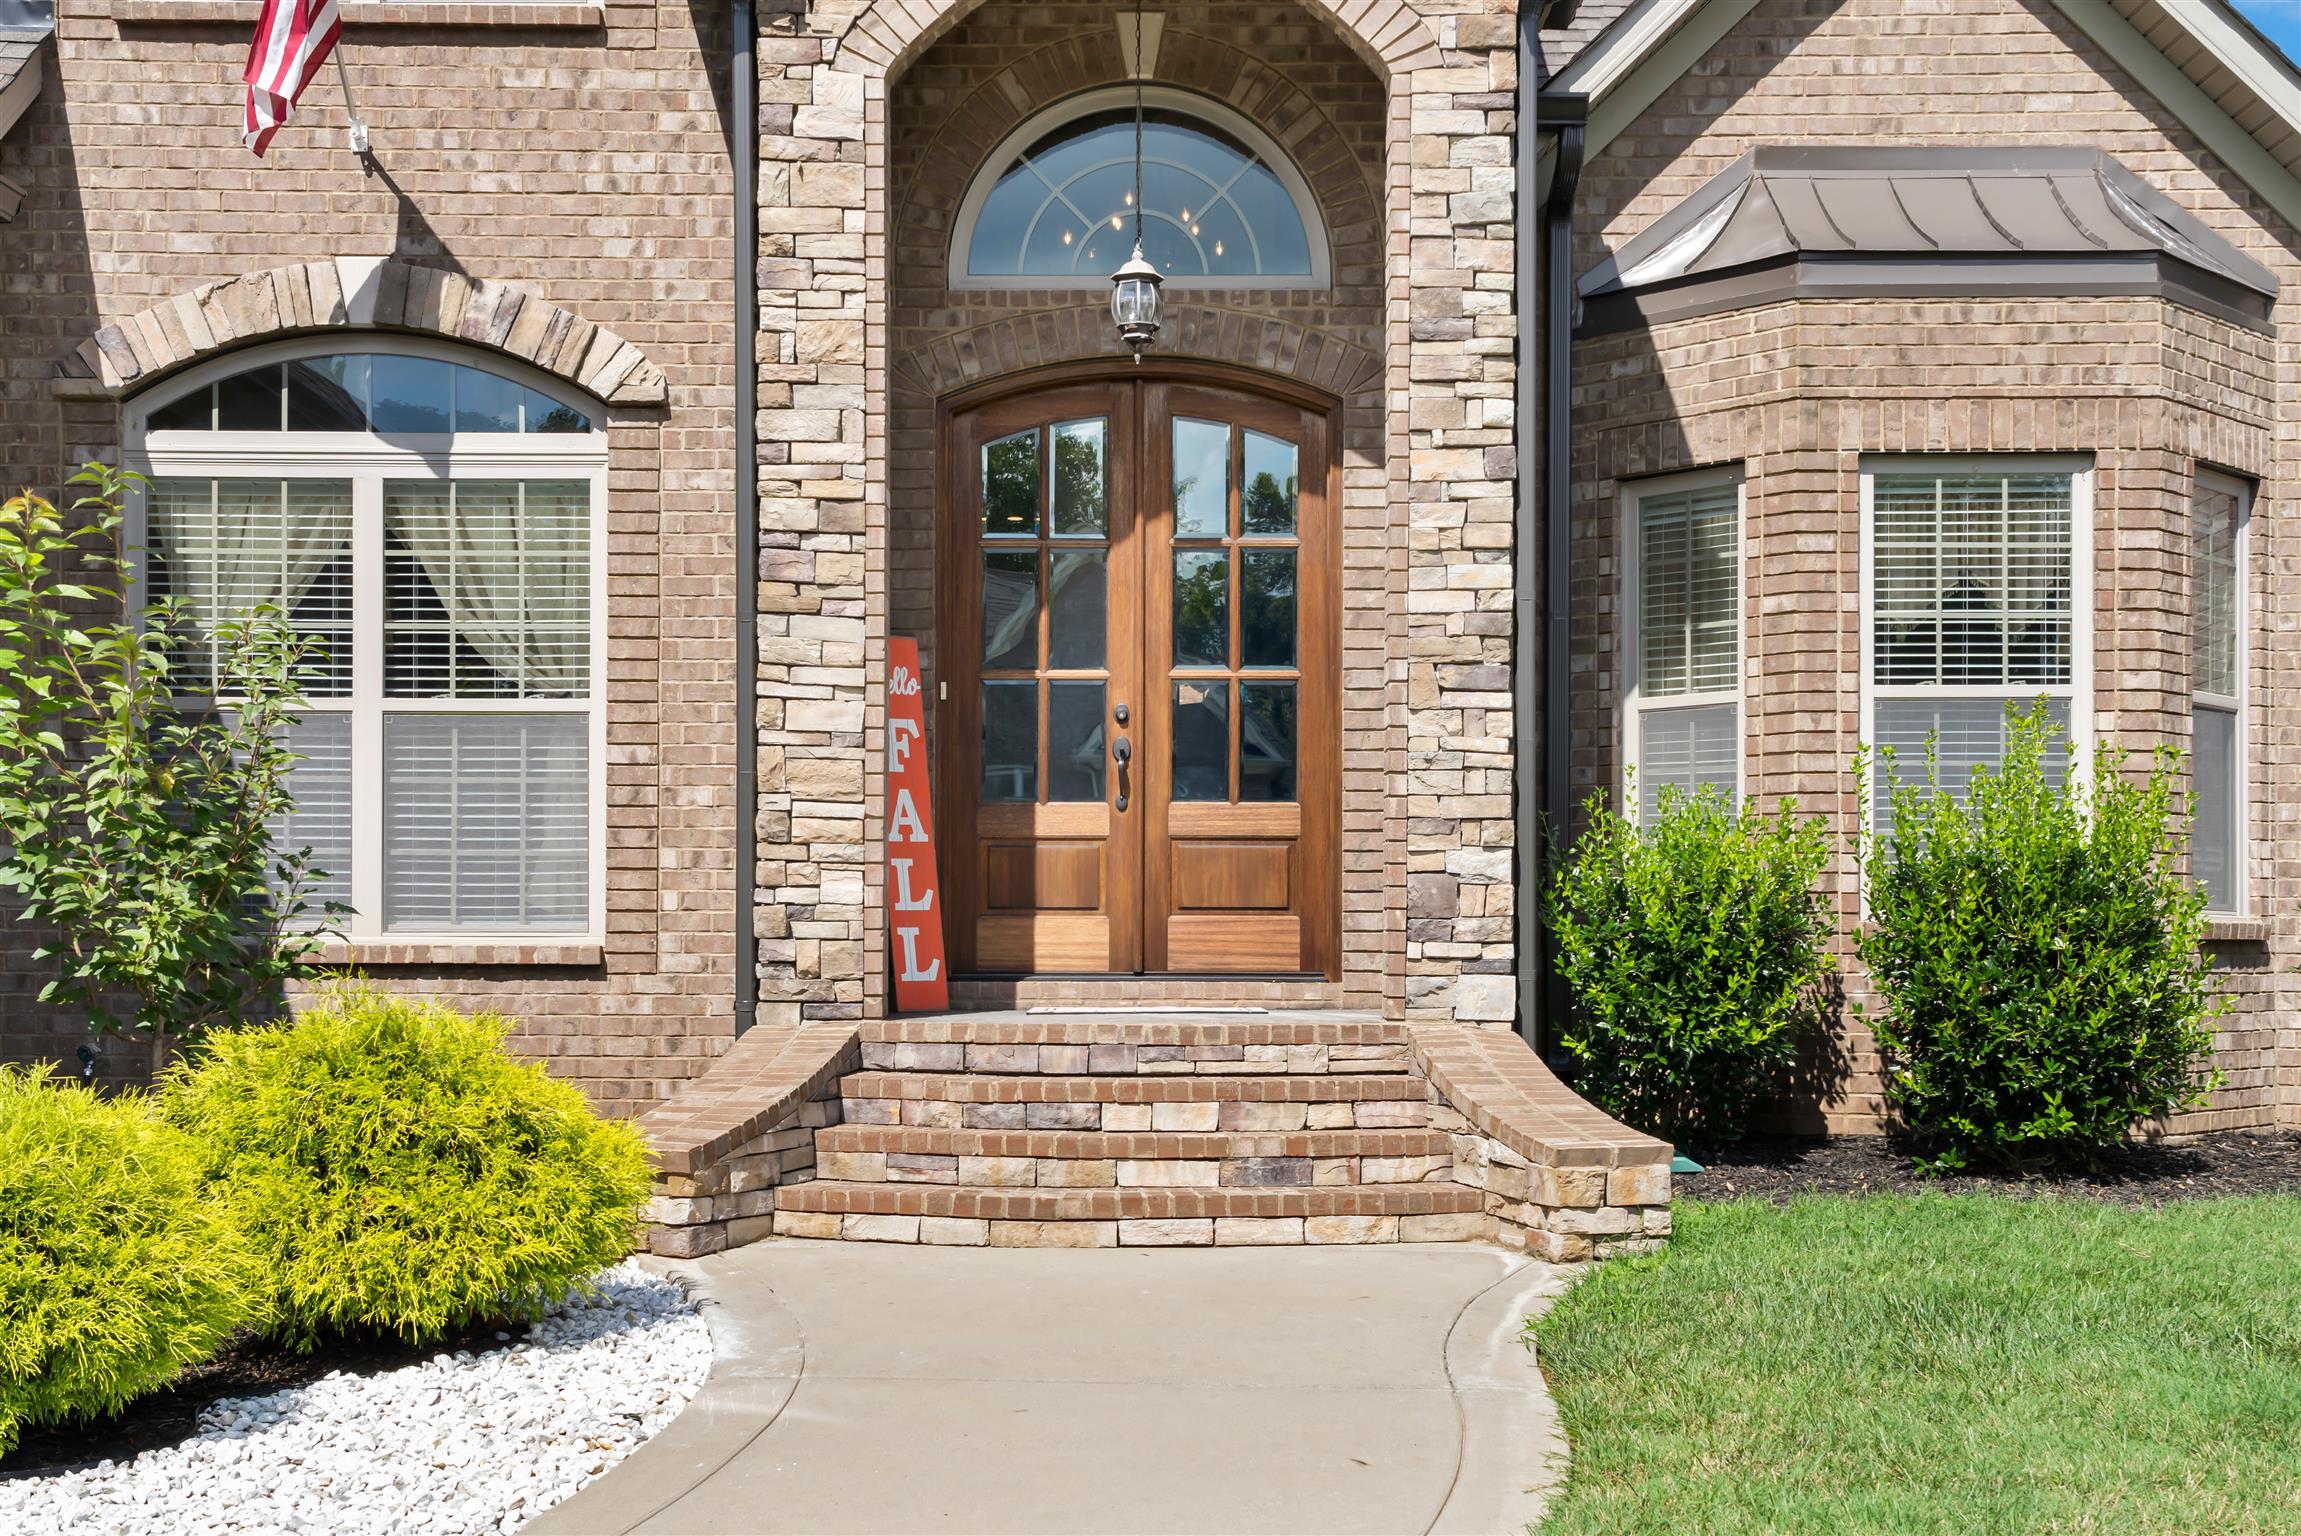 2452 Settlers Trce, Clarksville, TN 37043 - Clarksville, TN real estate listing